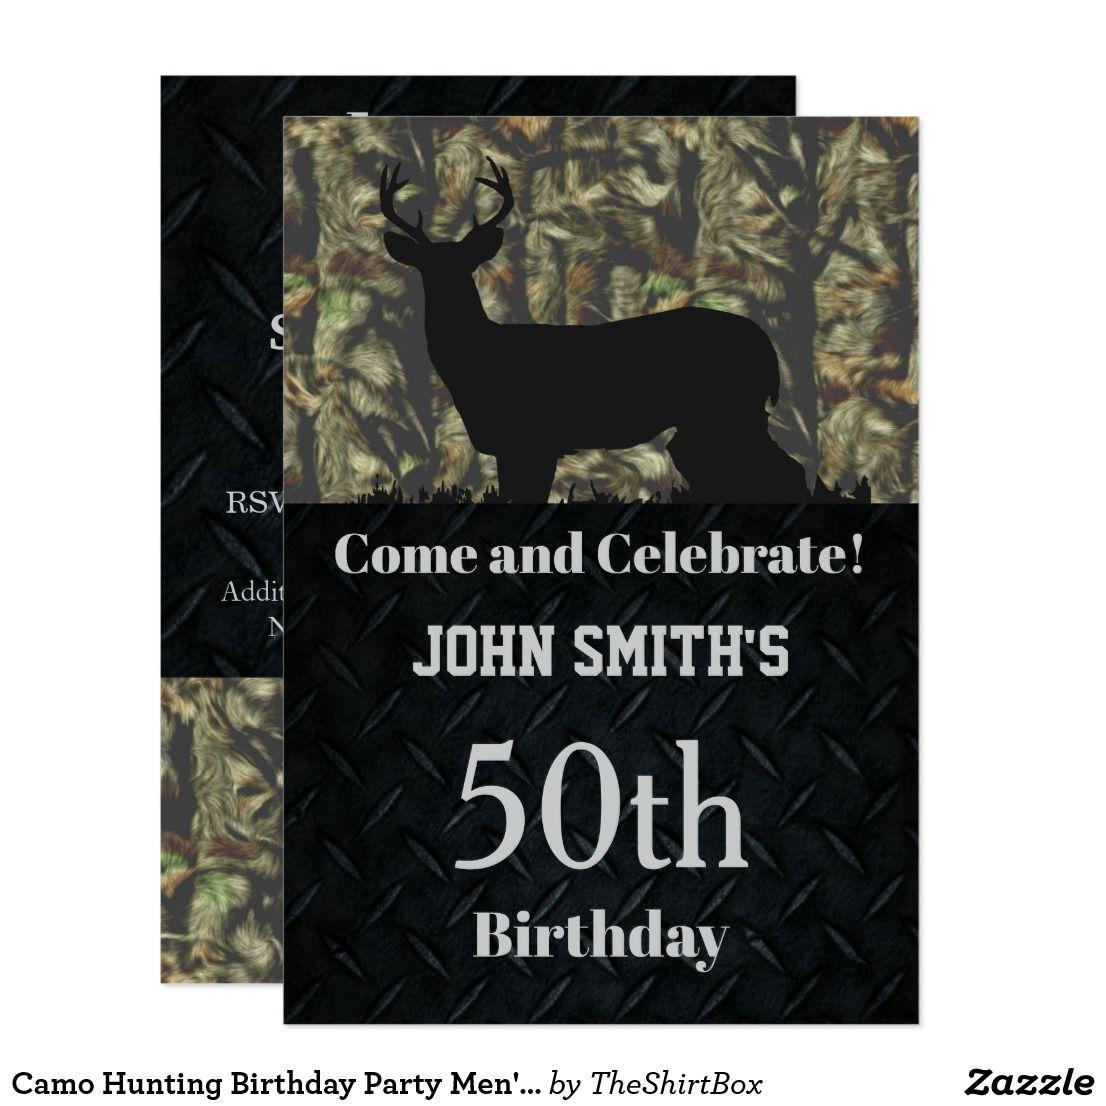 Camo Hunting Birthday Party Men\'s Invitations | Hunting birthday and ...